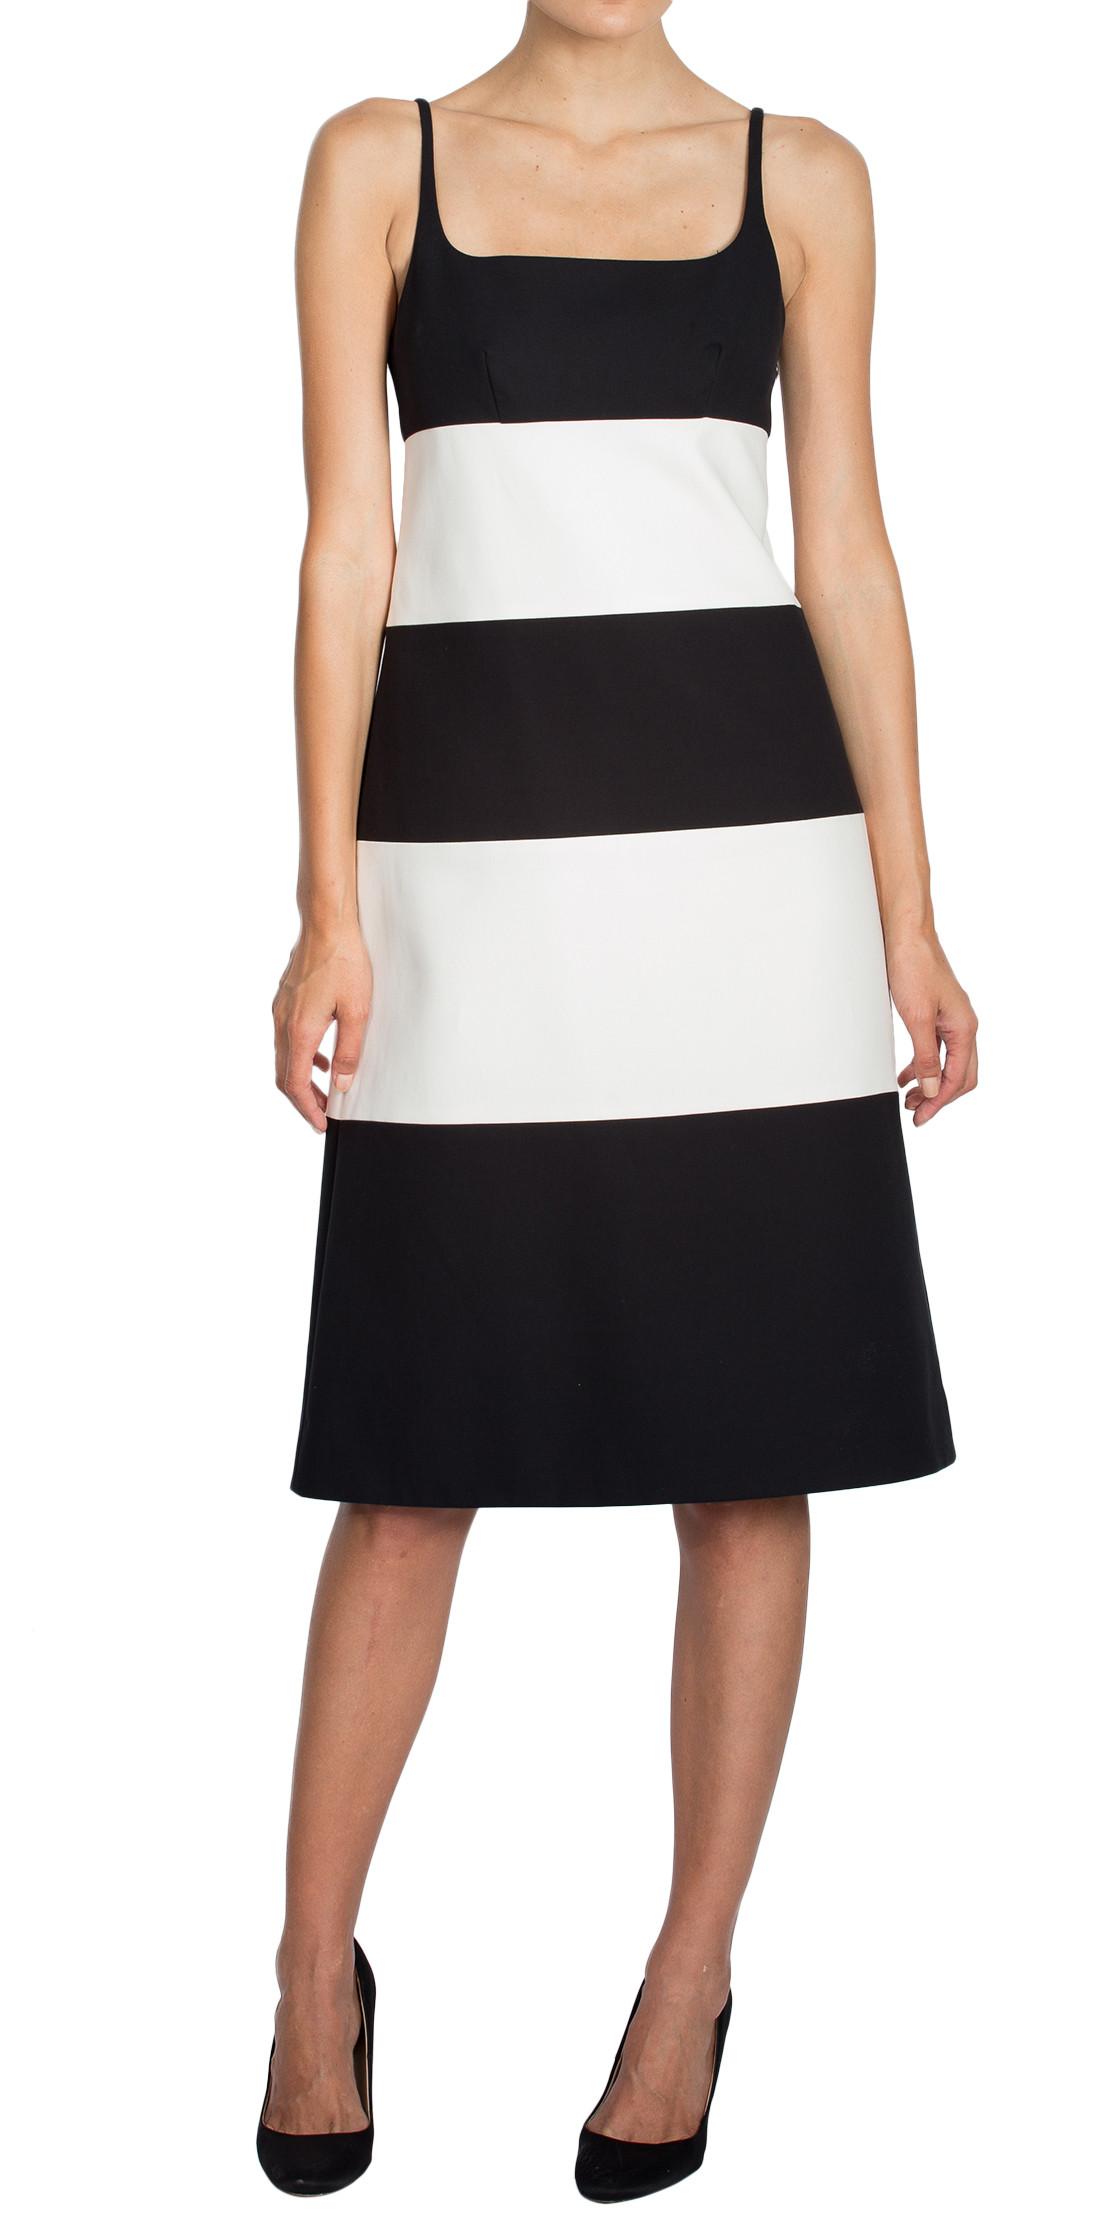 Marc Jacobs Two-Tone Sleeveless Dress